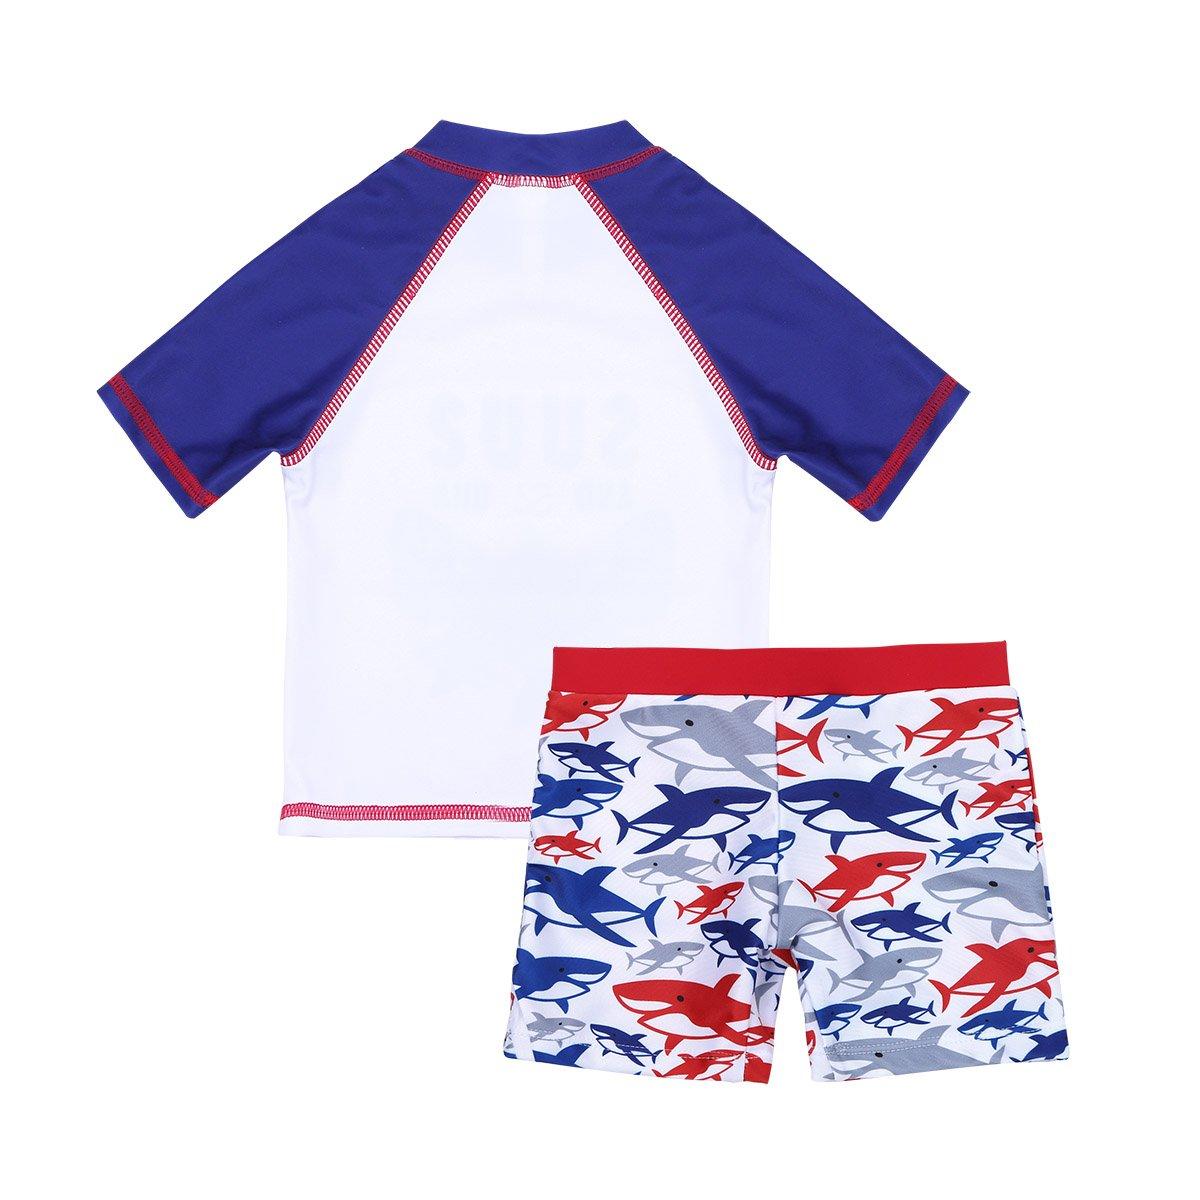 iiniim Kids Boys Swimsuit Rash Guard Top with Swim Shorts Trunks Swimming Costume Swimwear Suit 2Pcs//Set